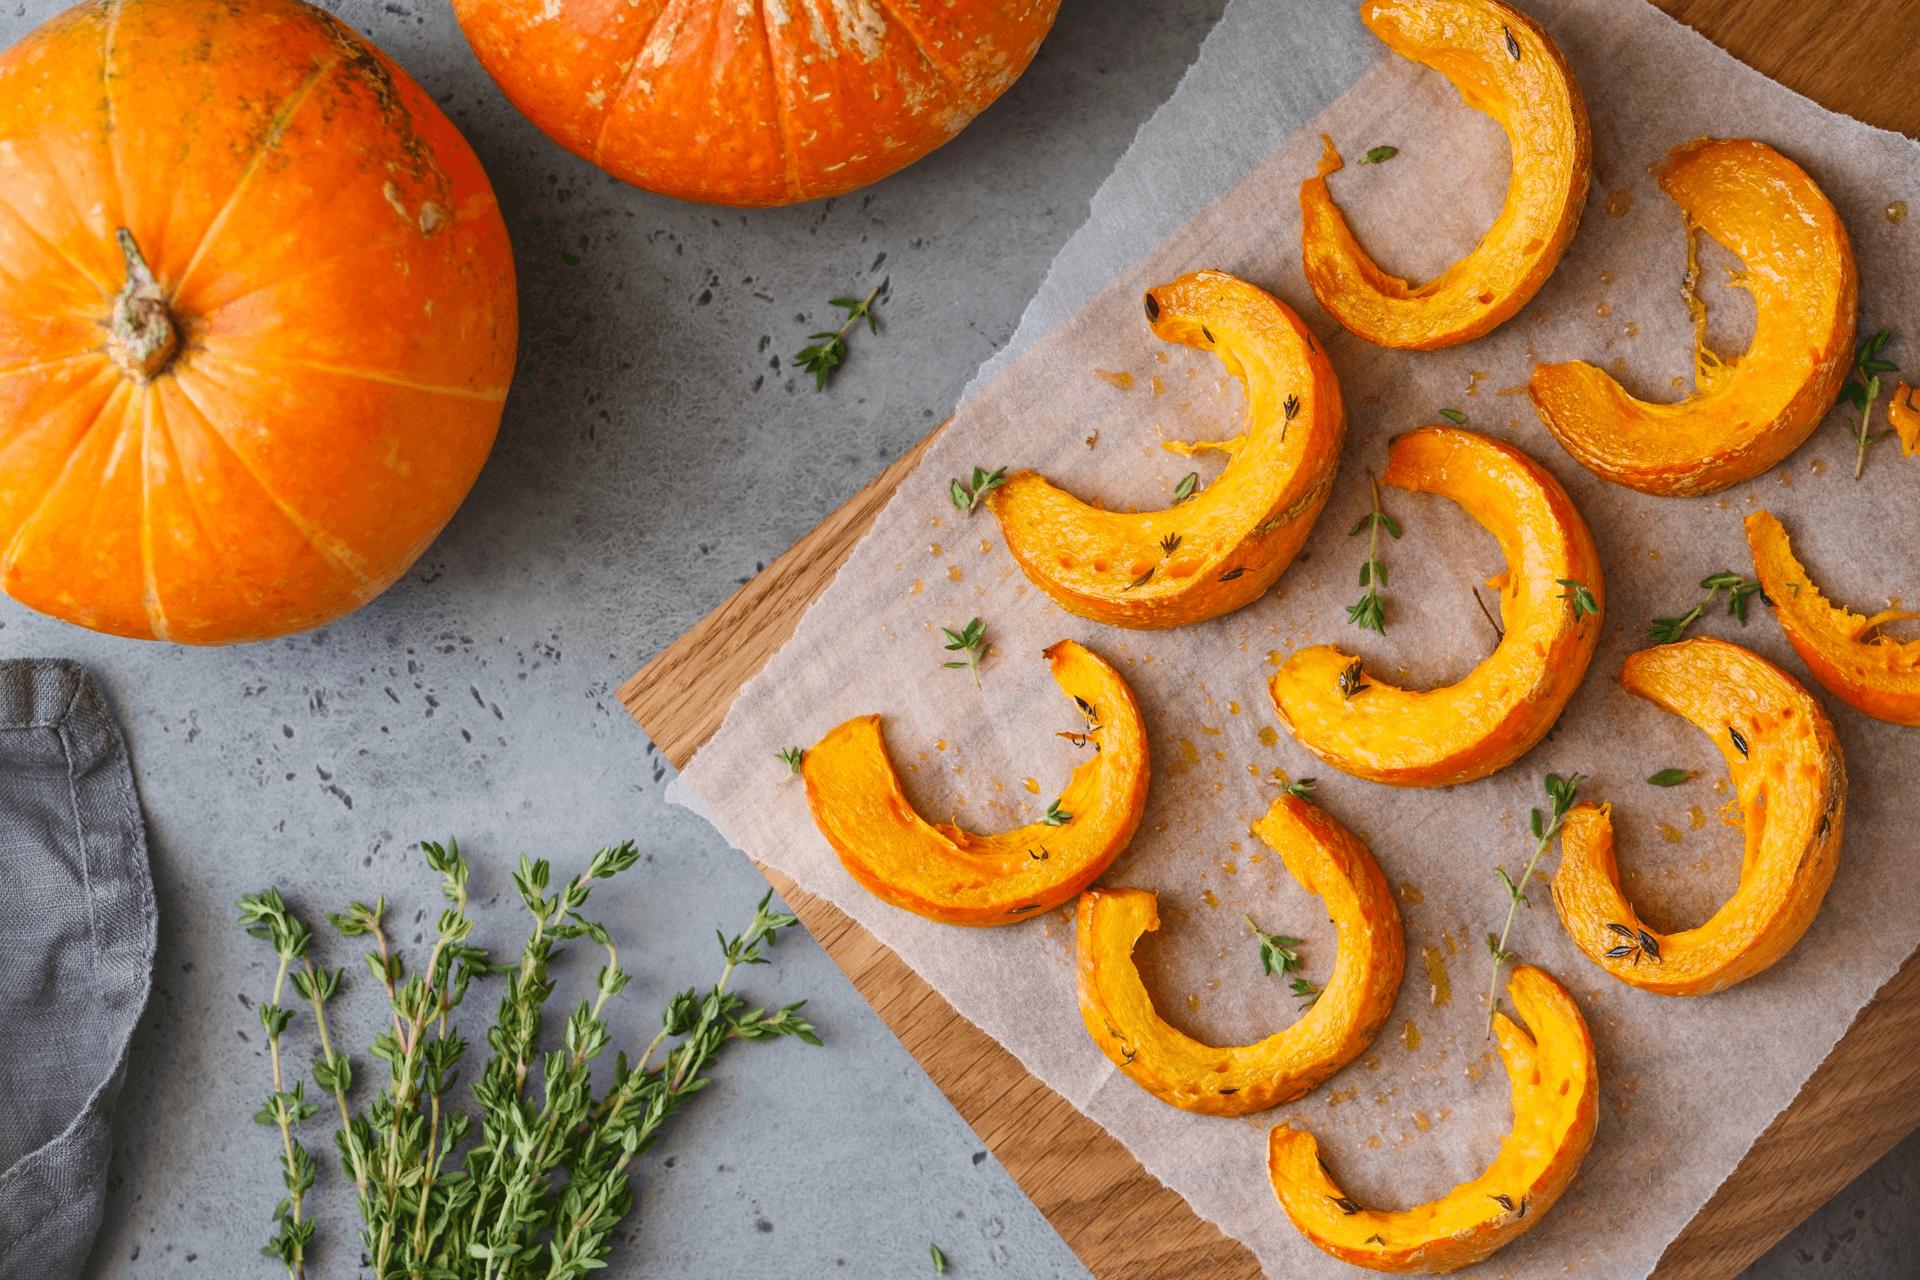 Whole and Sliced Pumpkins